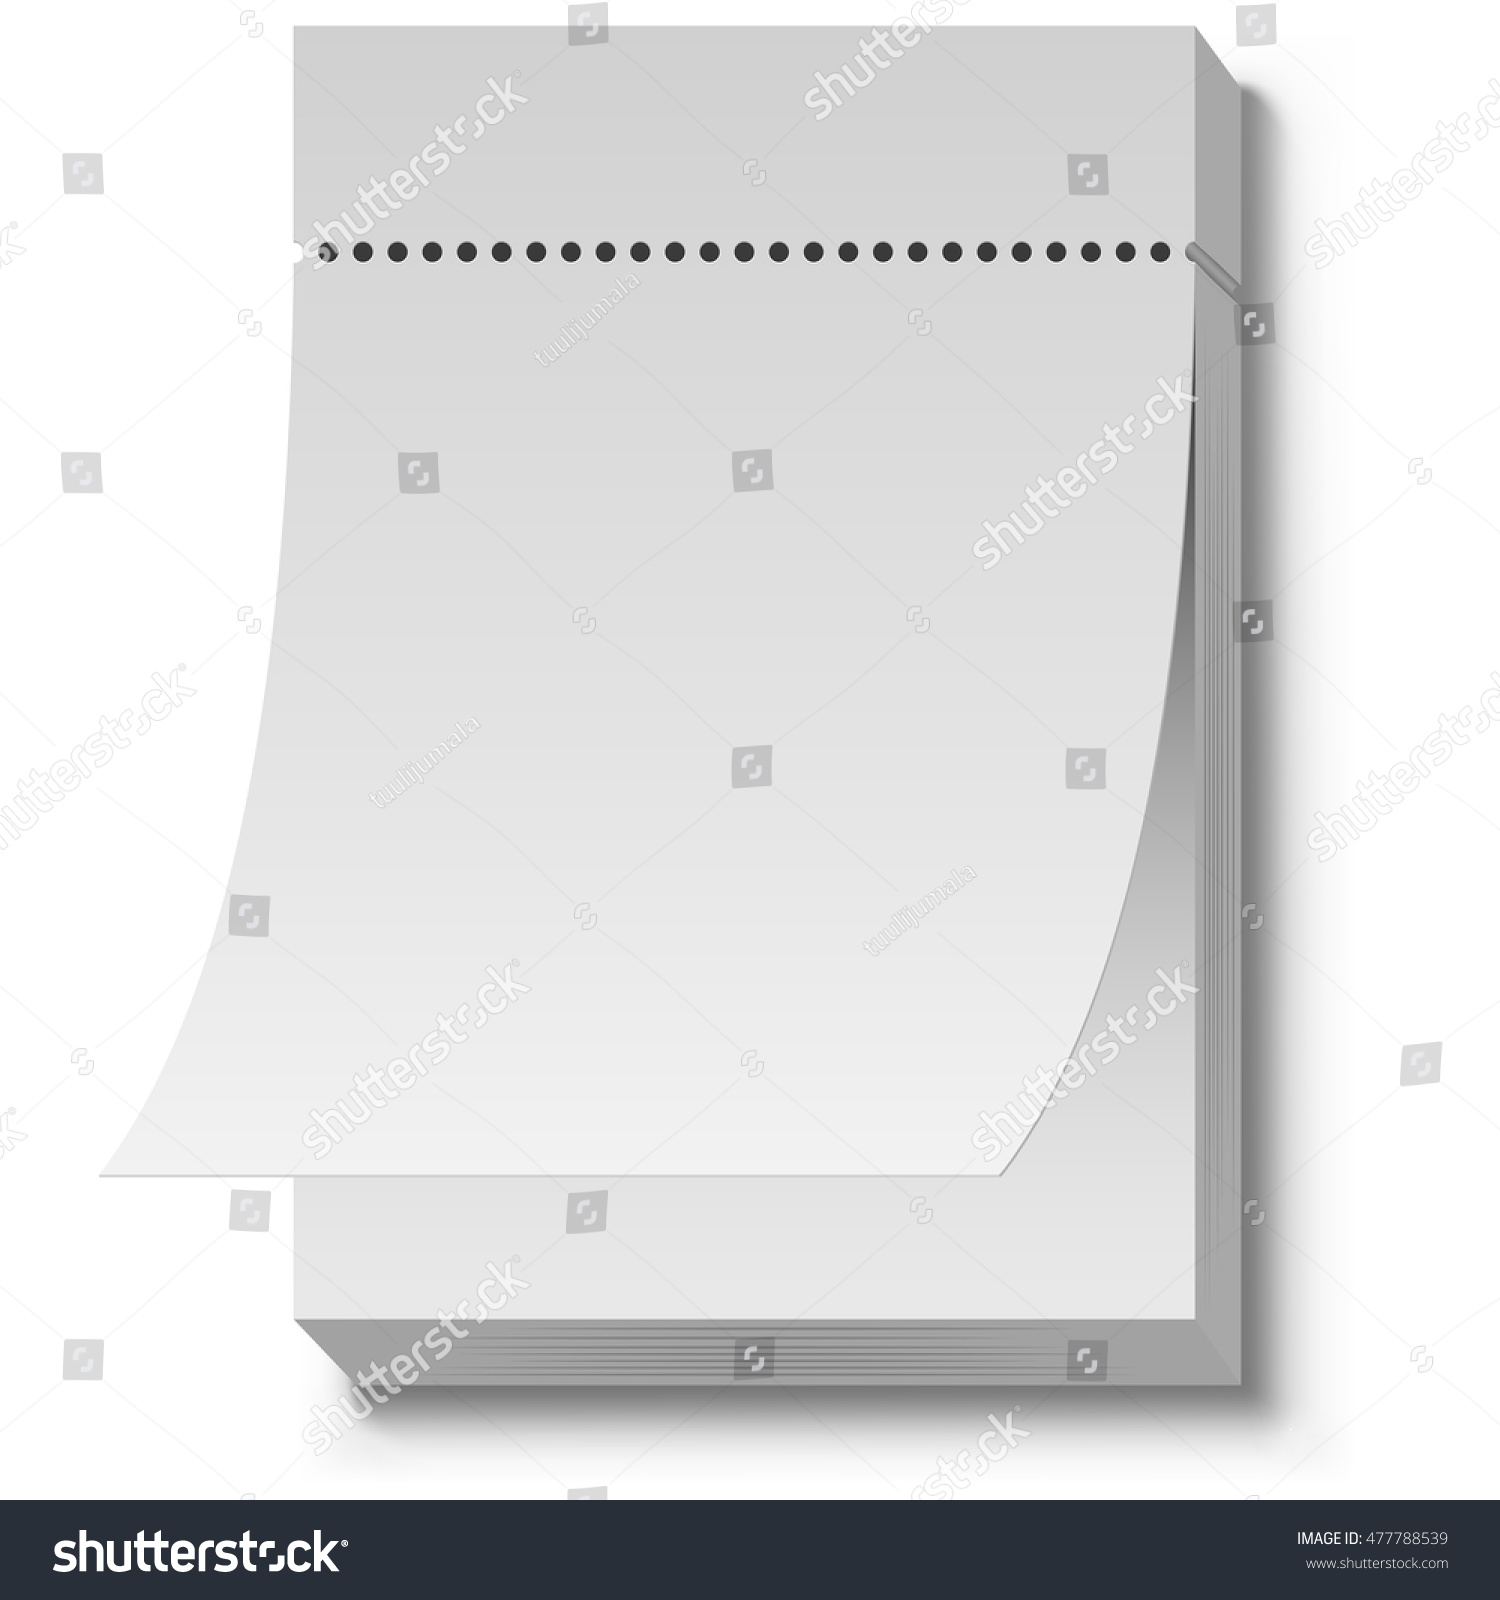 Blank White Tear Off Wall Calendar Stock Vector HD (Royalty Free ...